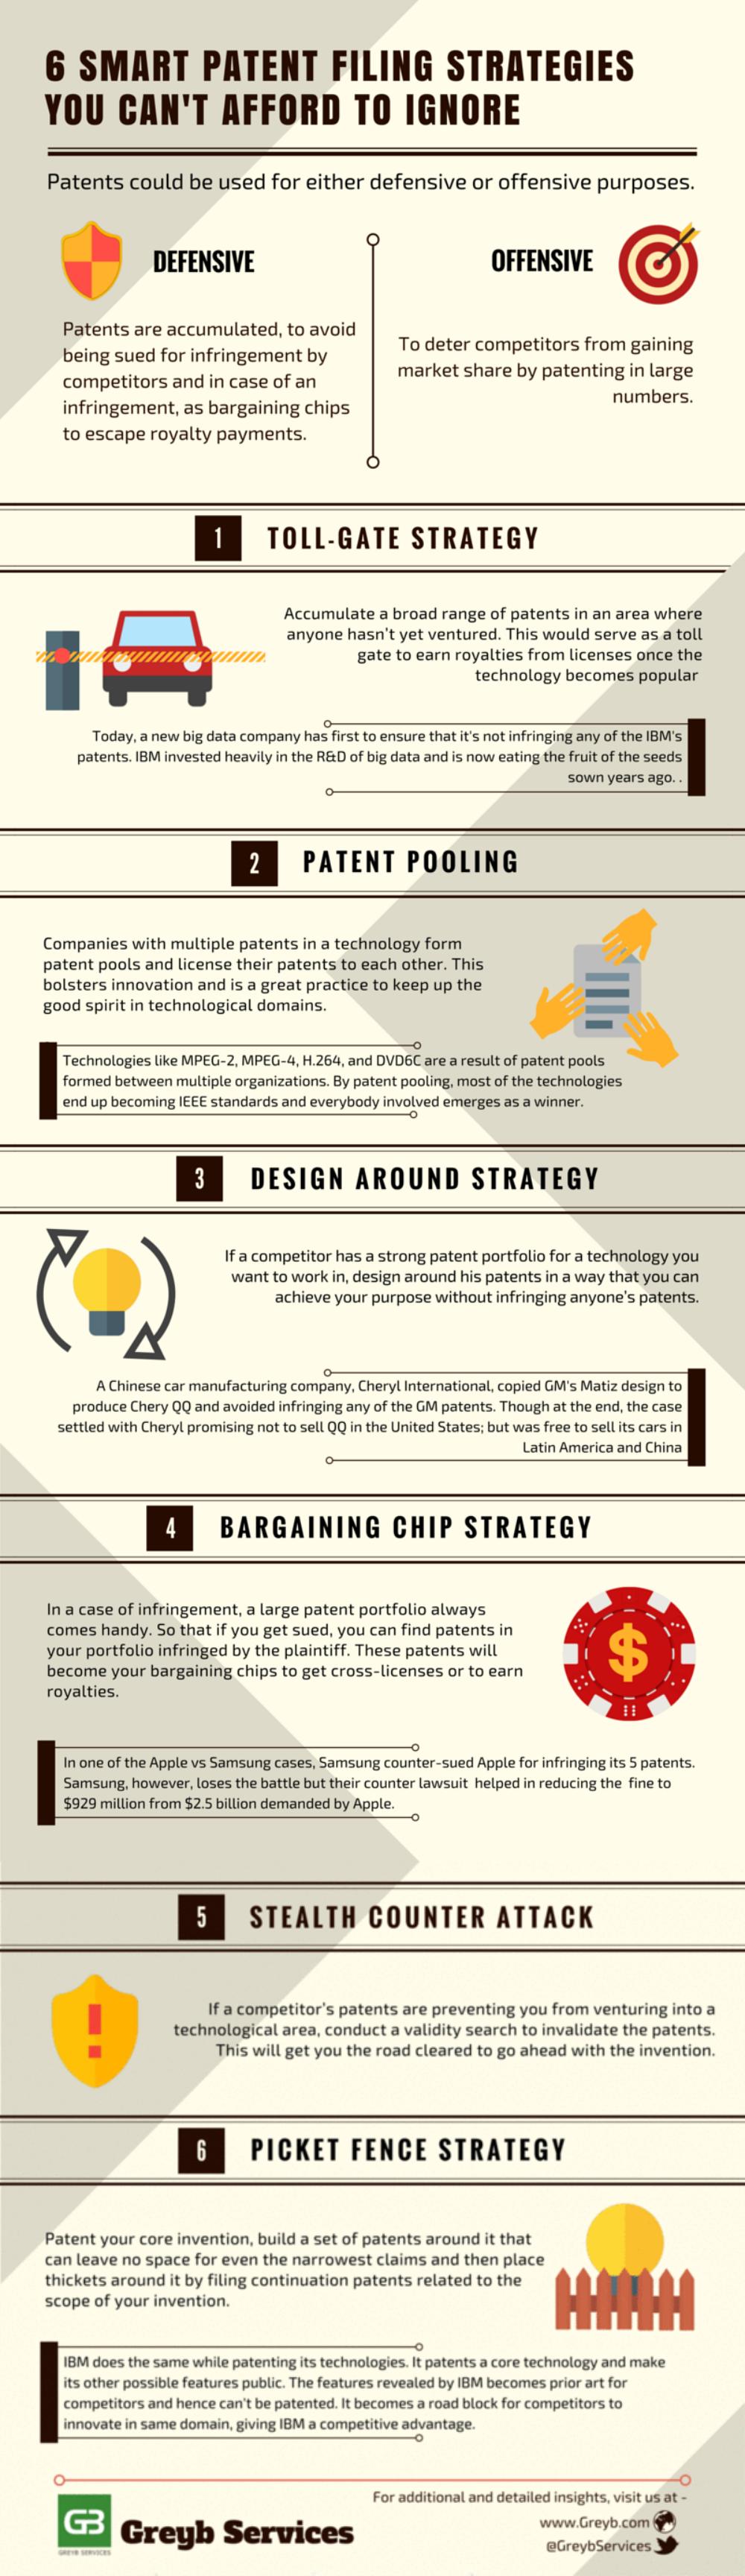 Smart-patent-filing-strategies-infograph